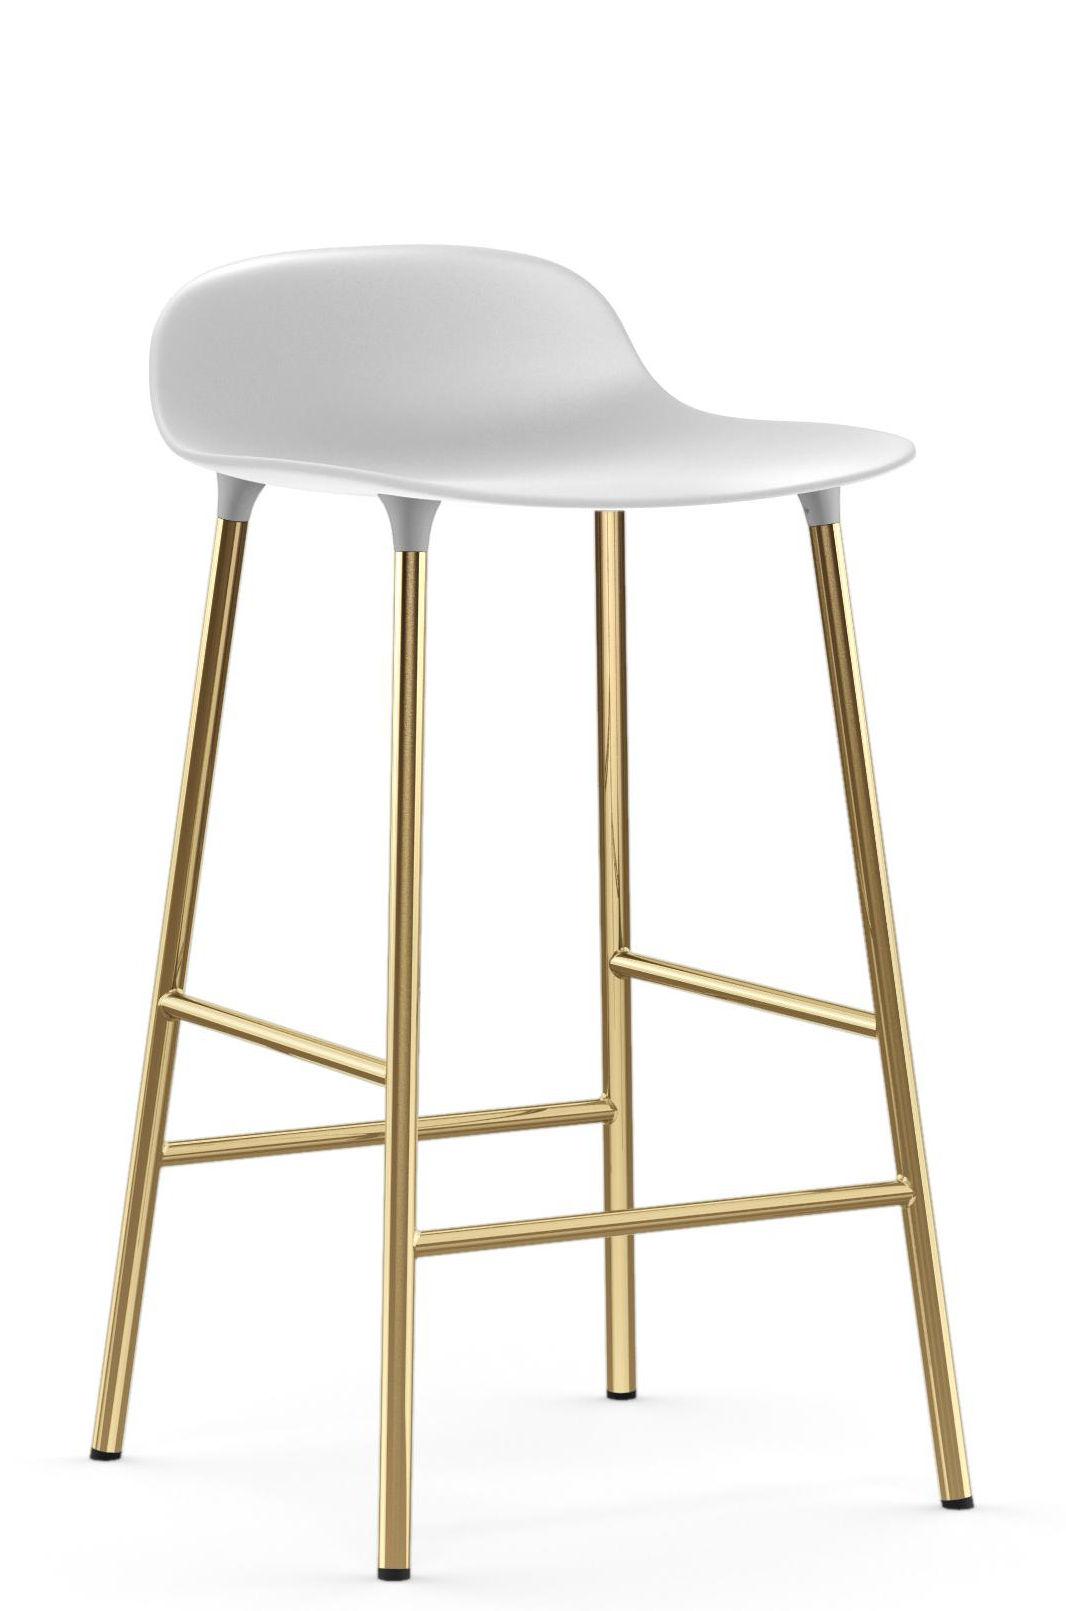 Arredamento - Sgabelli da bar  - Sgabello bar Form - / H 65 cm - Gambe ottone di Normann Copenhagen - Bianco / Ottone - Acier plaqué laiton, Polipropilene